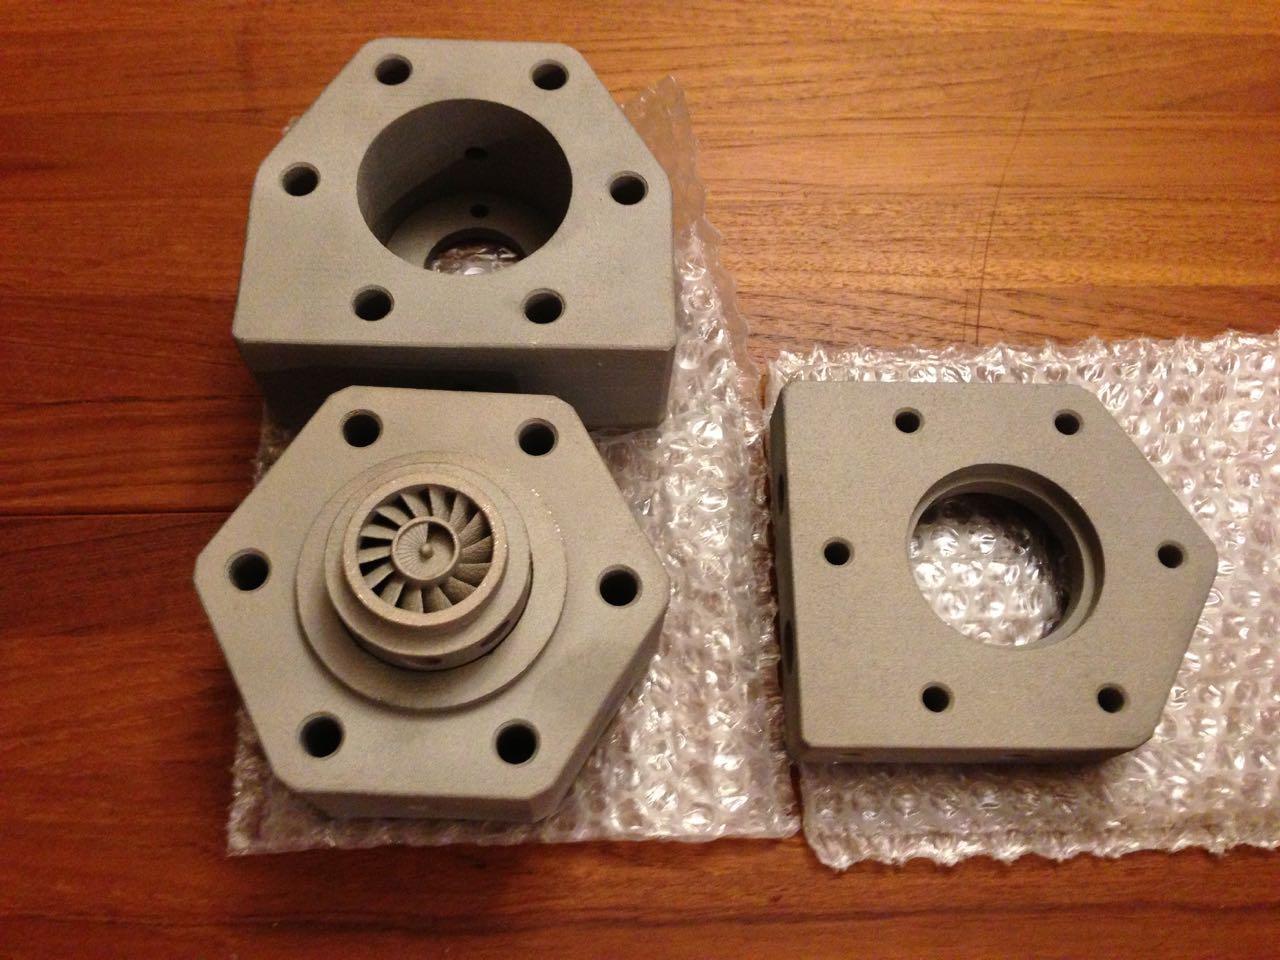 Supercritical CO2 Turbine Generator 3D Metal Printed Kit